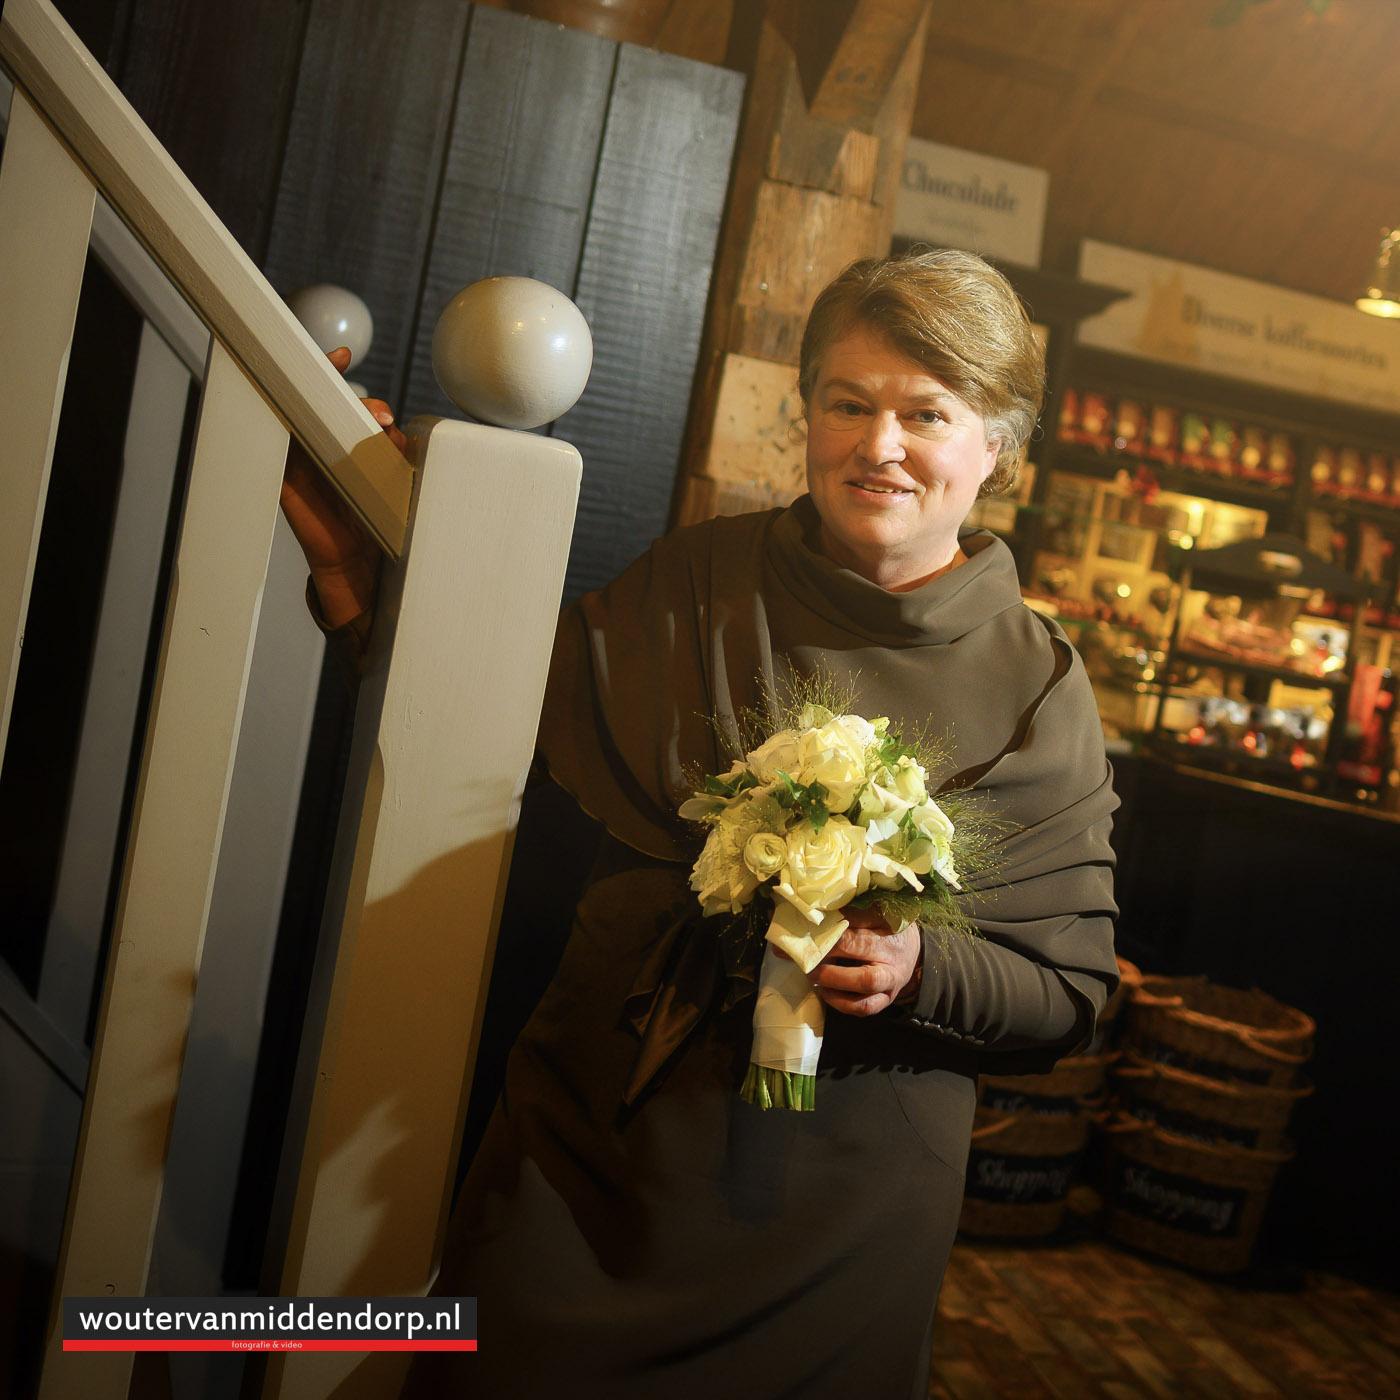 bruidsfotografie Wouter van Middendorp Uddel Elspeet Barneveld, omgeving trouwfotograaf-14